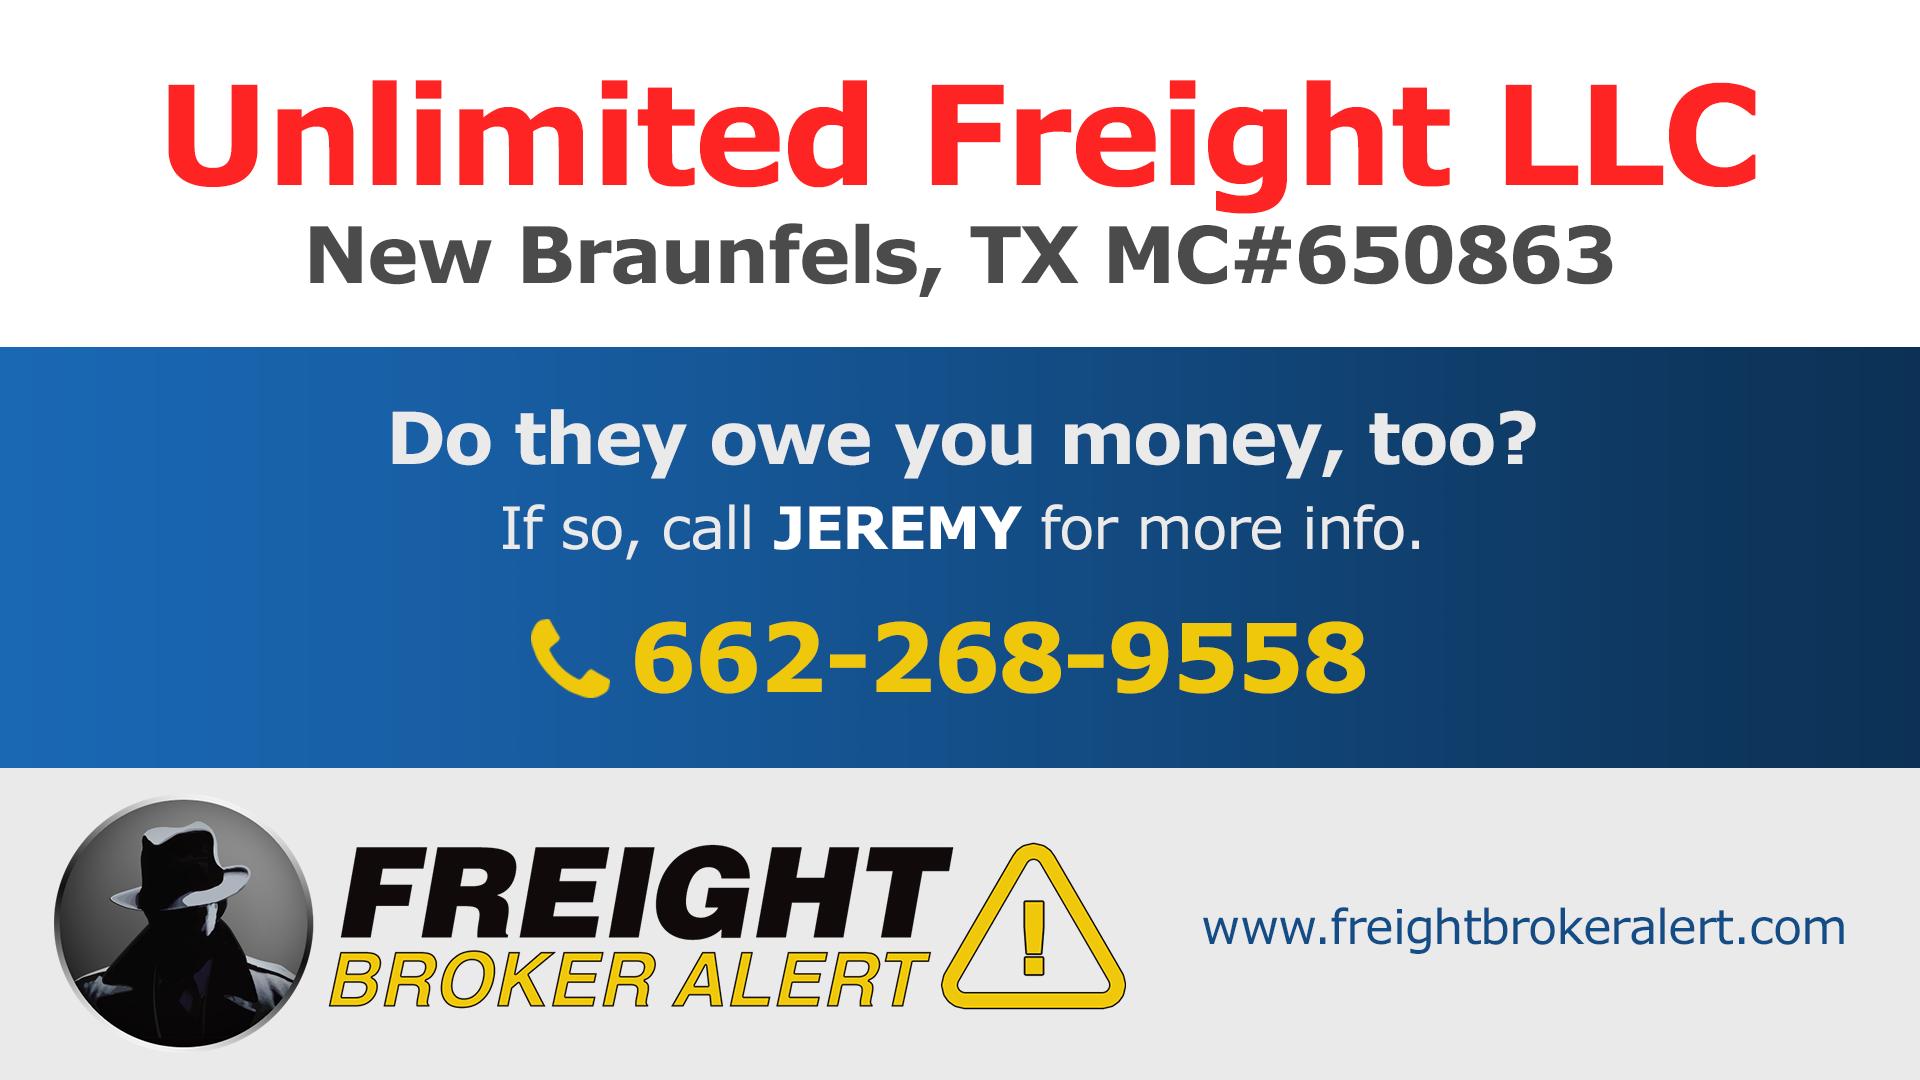 Unlimited Freight LLC Texas